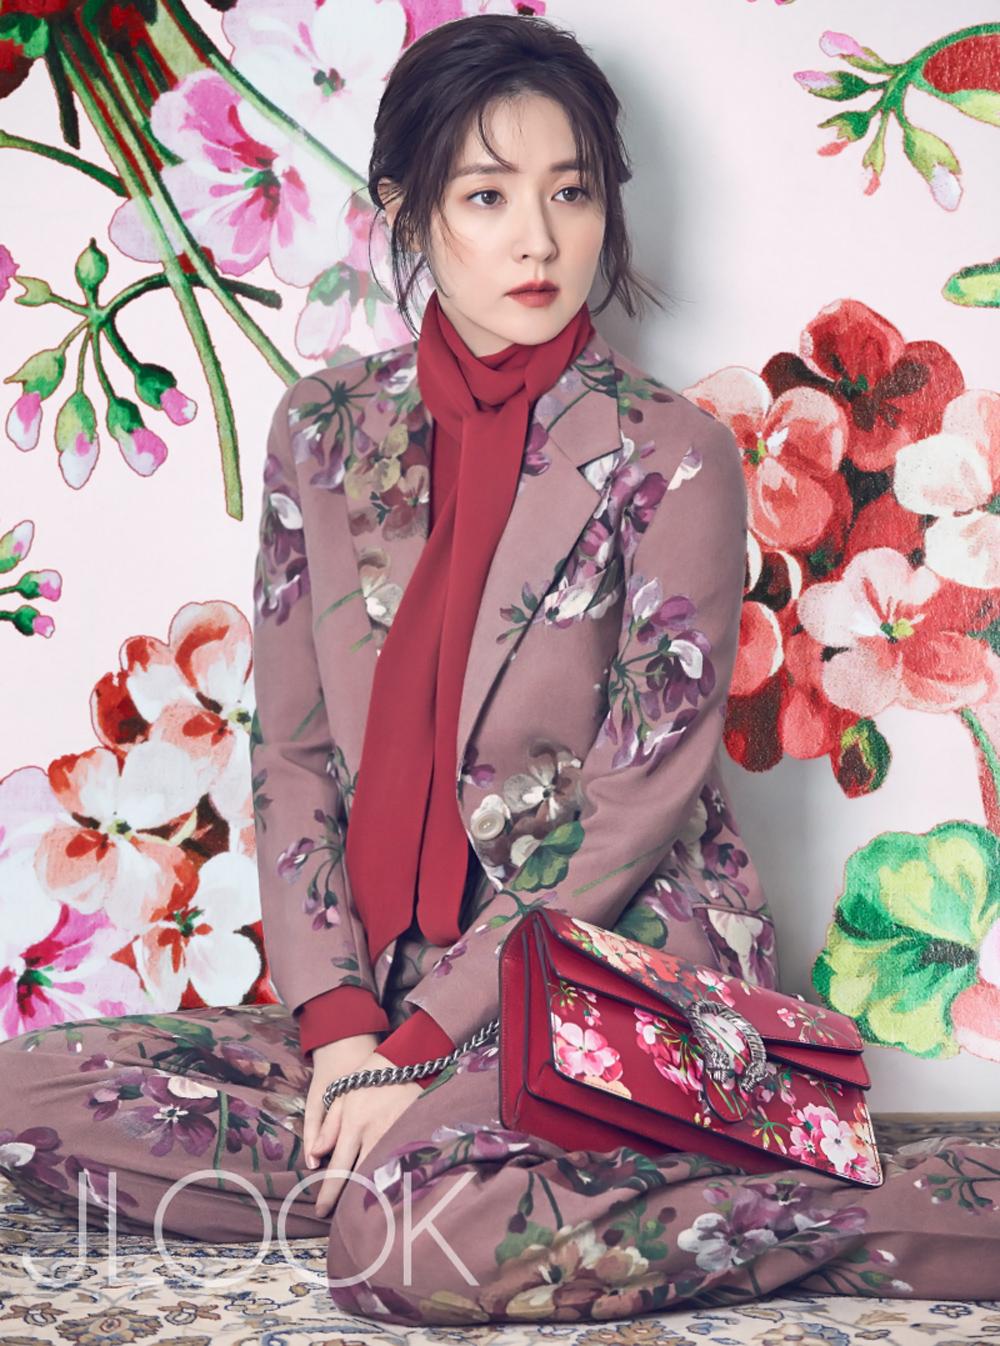 SBS 2016 <사임당,The Herstory>  出演人物:李英愛、宋承憲